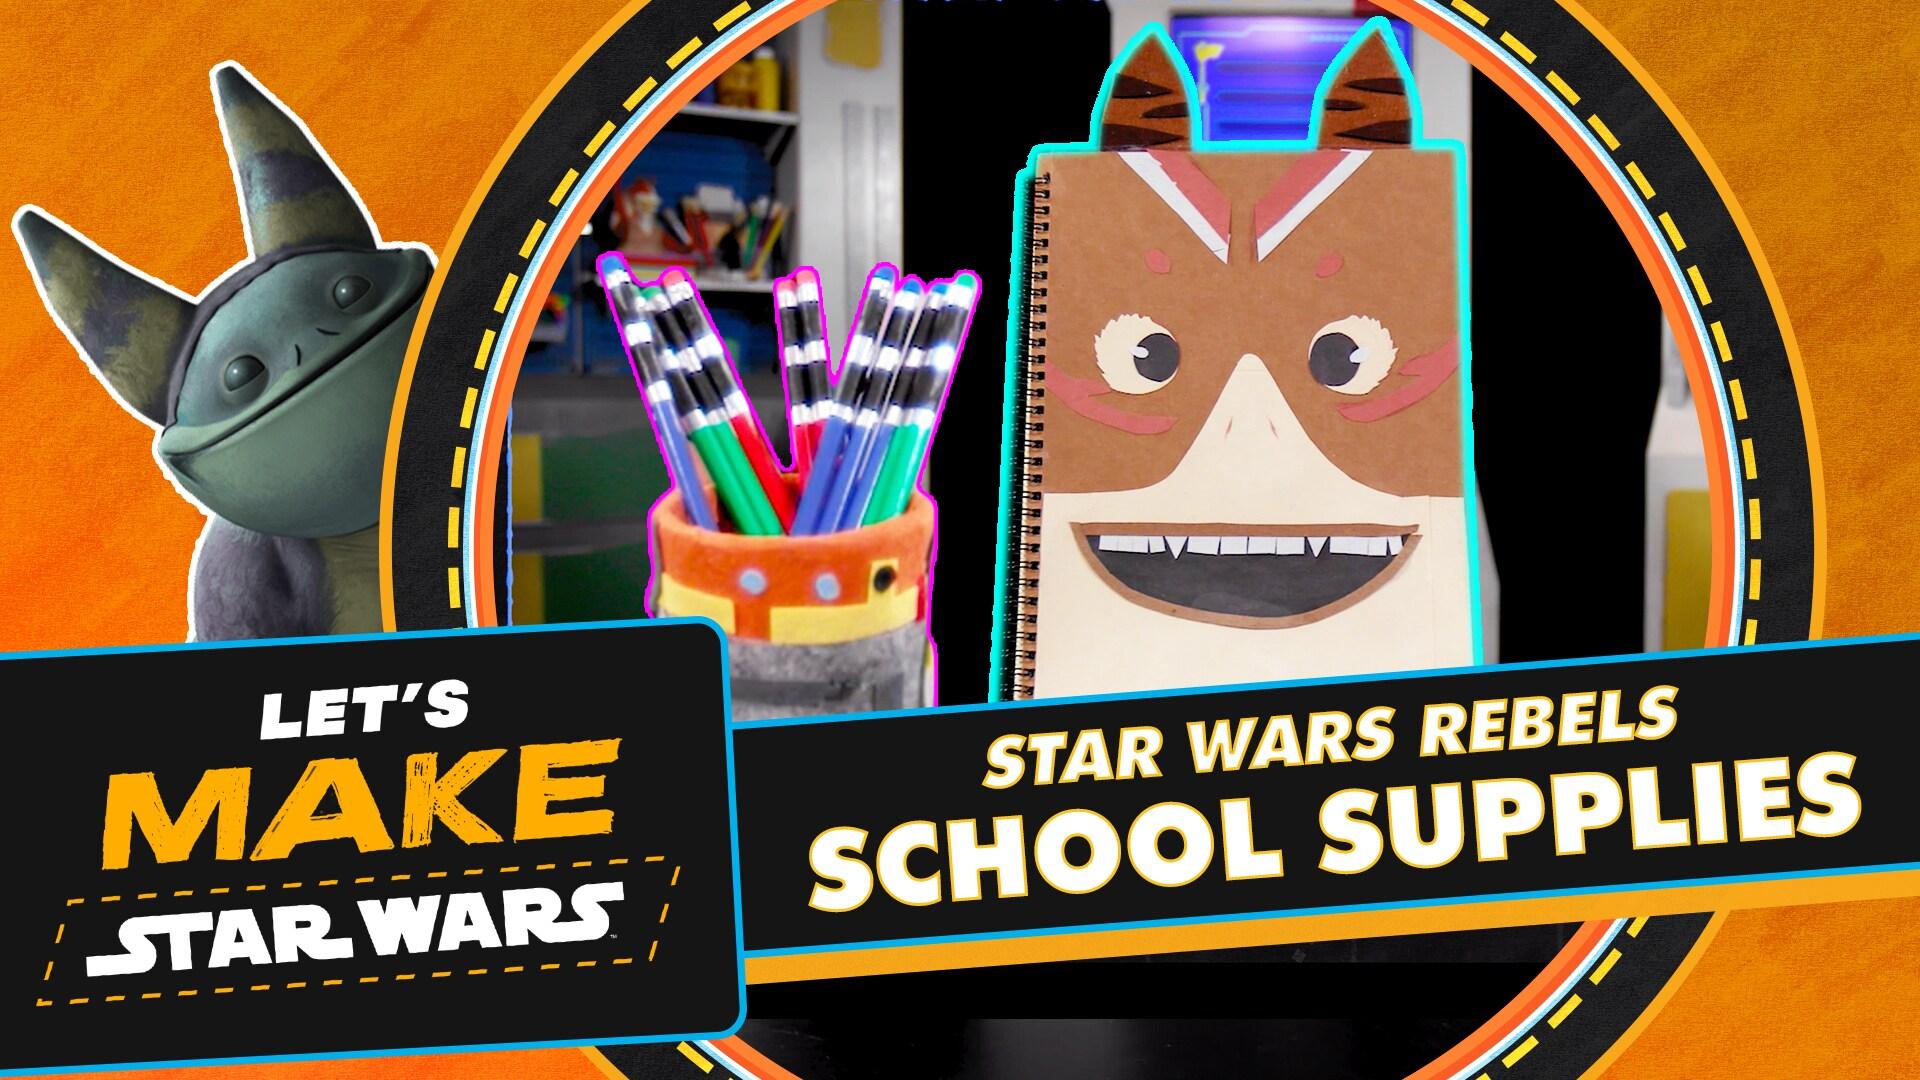 How to Make Star Wars Rebels School Supplies | Let's Make Star Wars